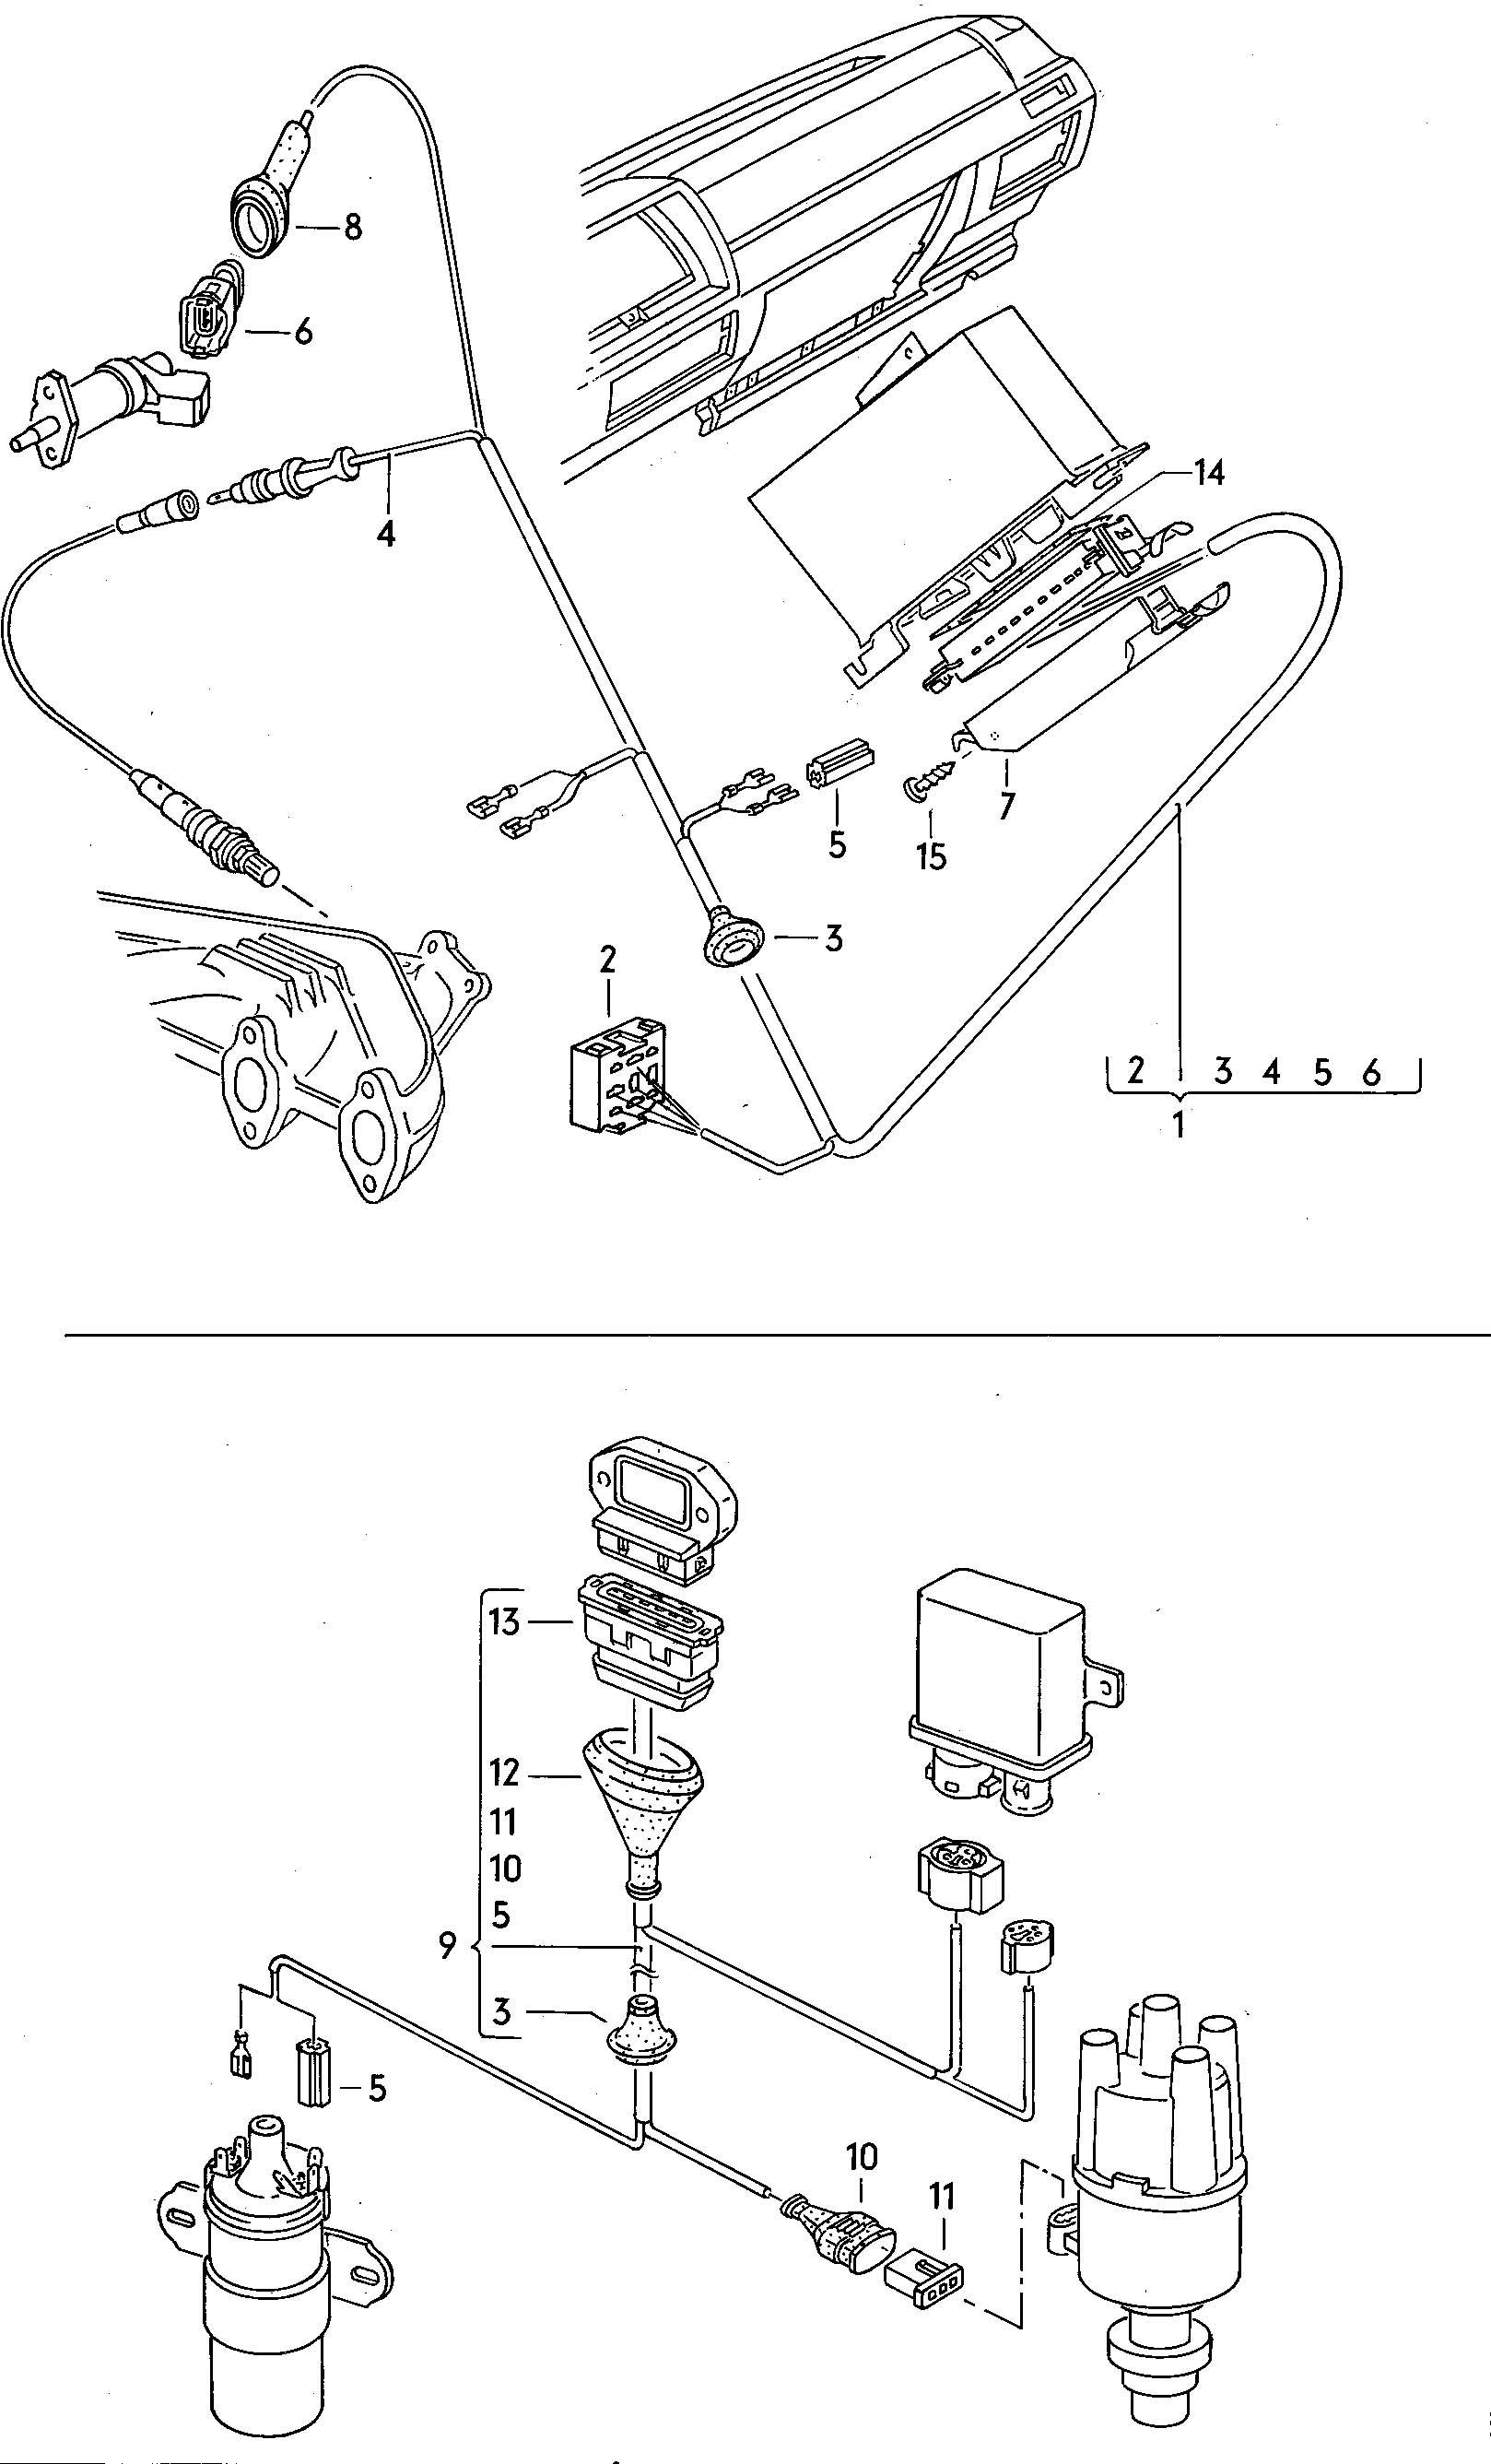 Volkswagen Dasher Harness For Oxygen Sensor And